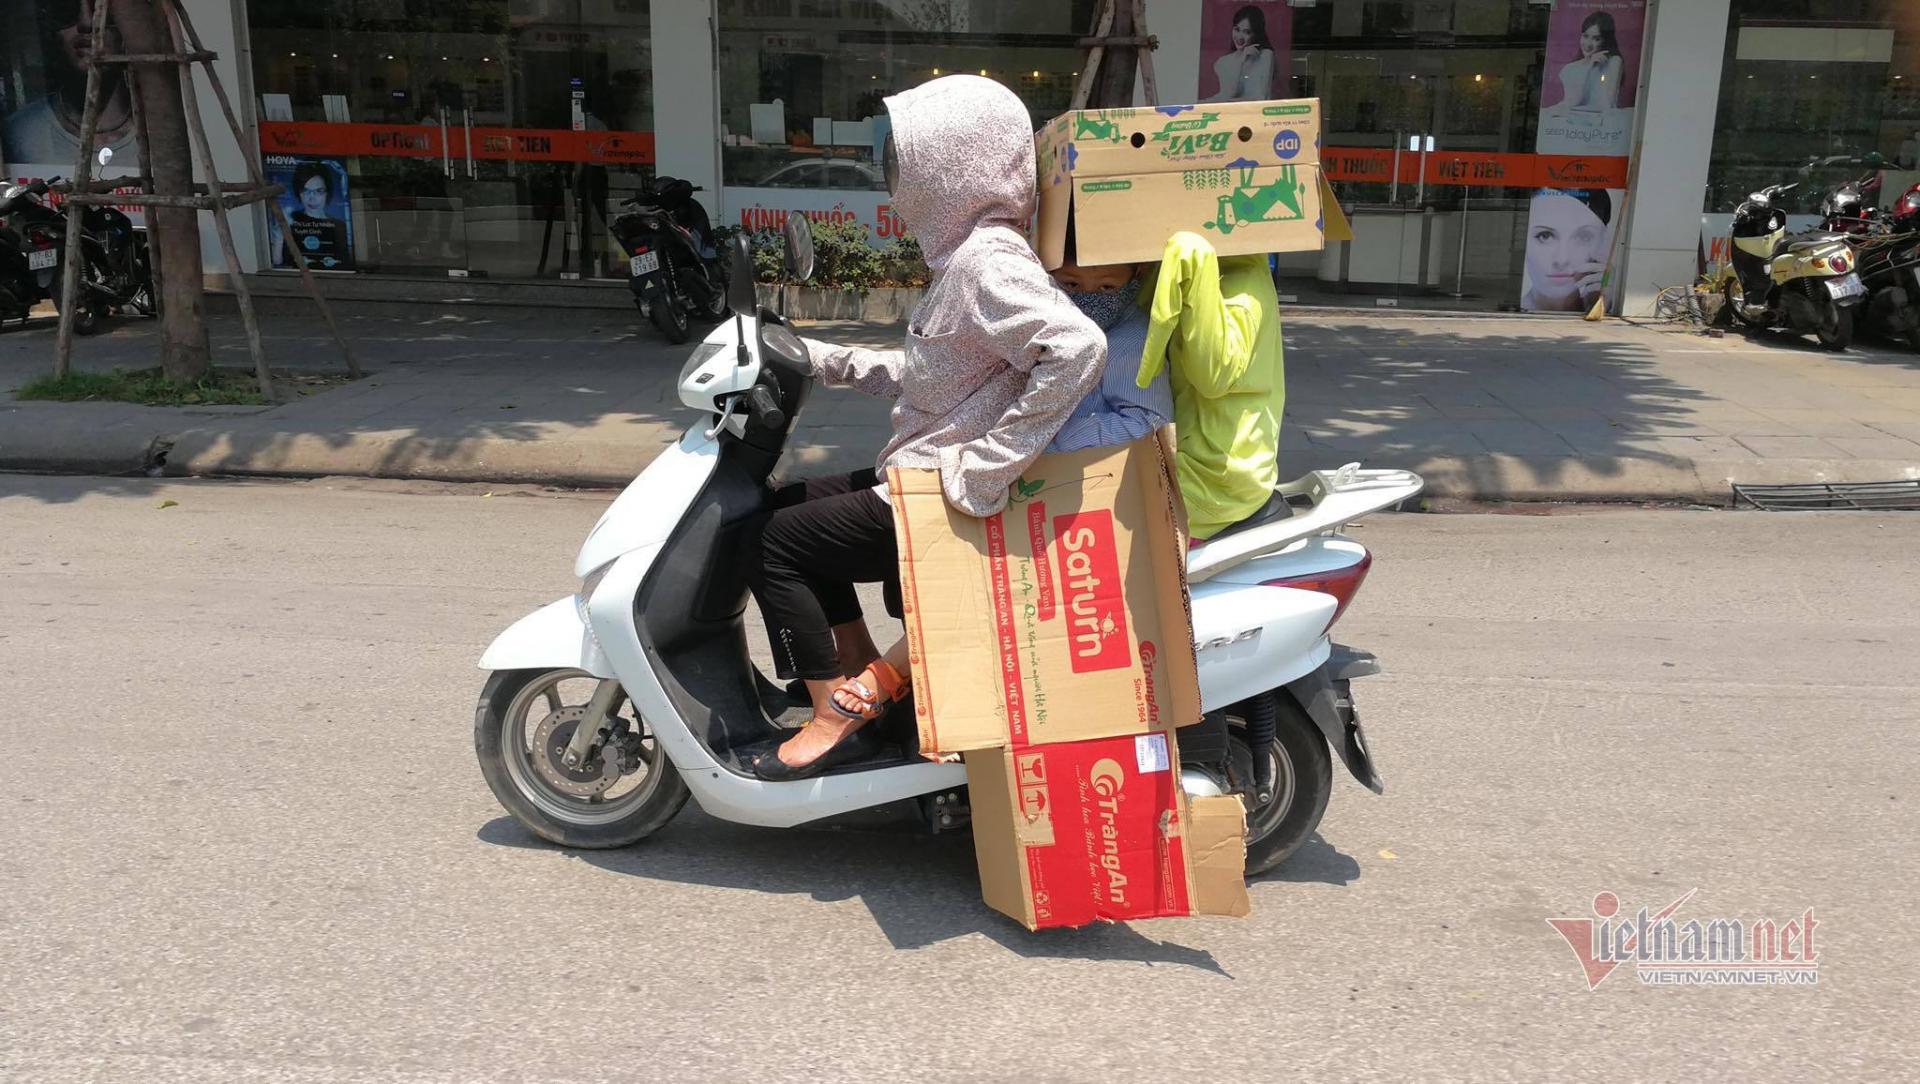 vietnam weather forecast july 10 heatwave to continue scorching vietnams northern central